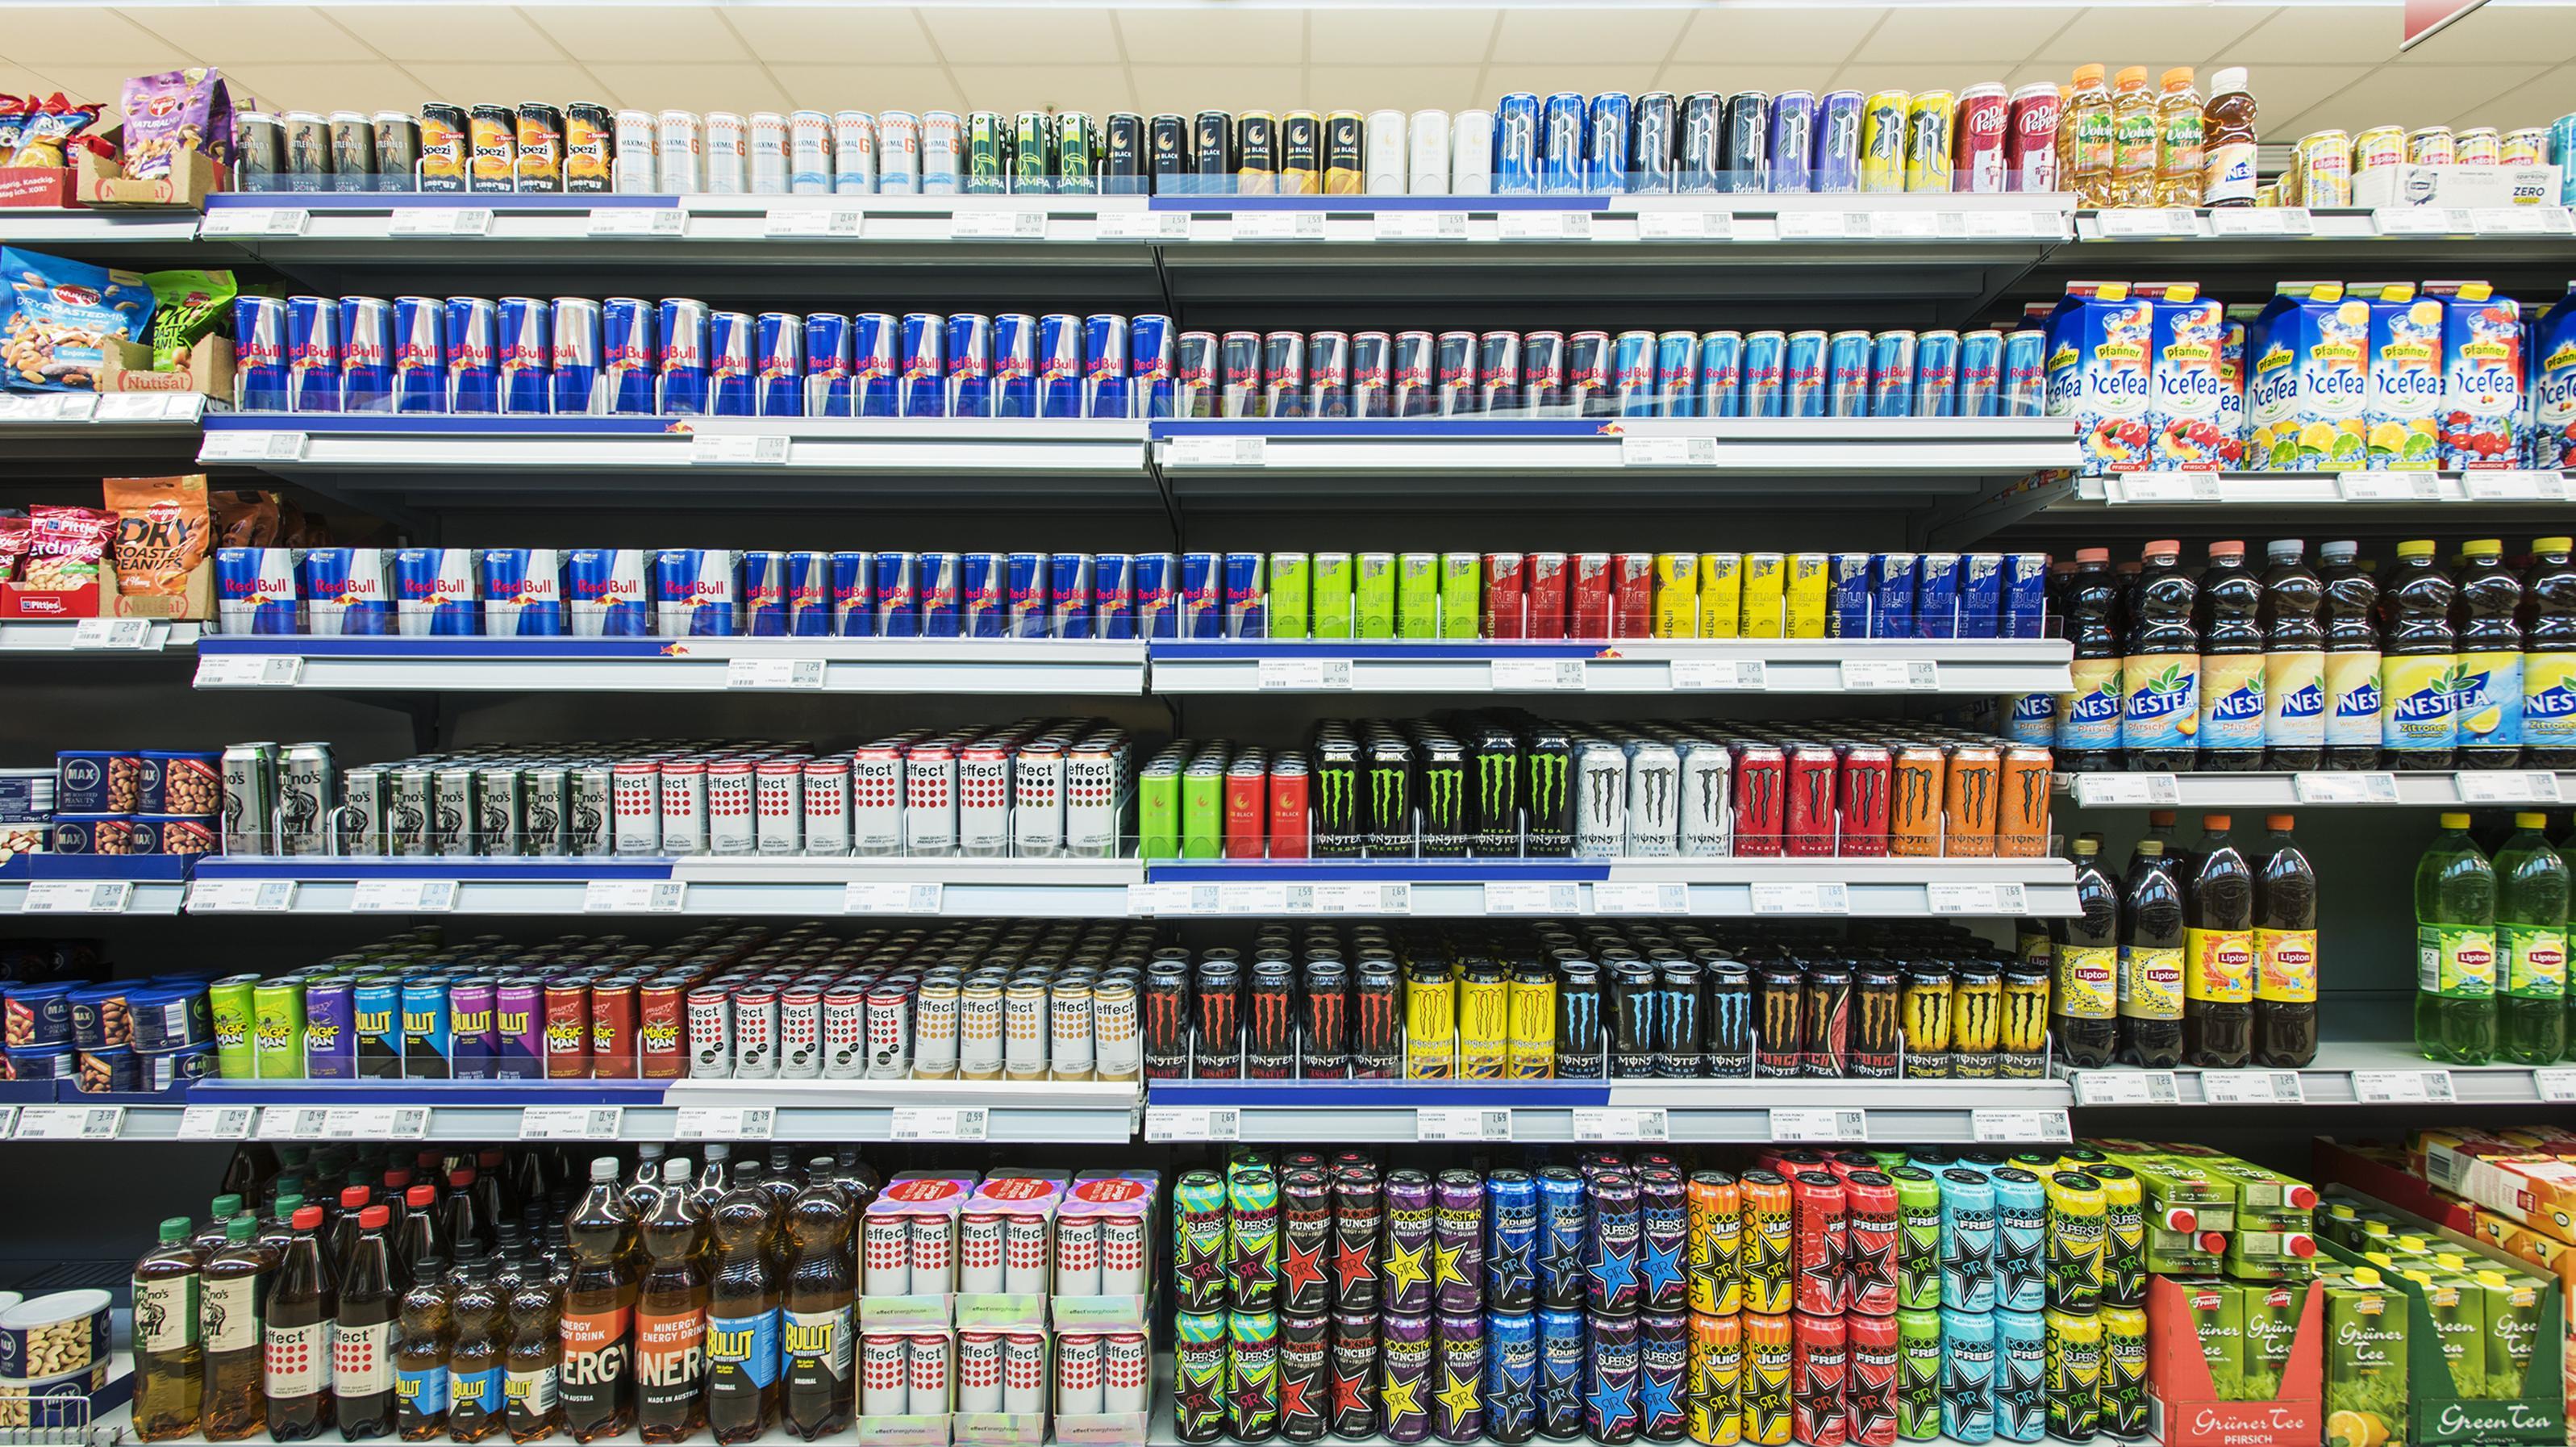 Red Bull Getränke Kühlschrank : Platzierungskonzept: red bull mags geordnet